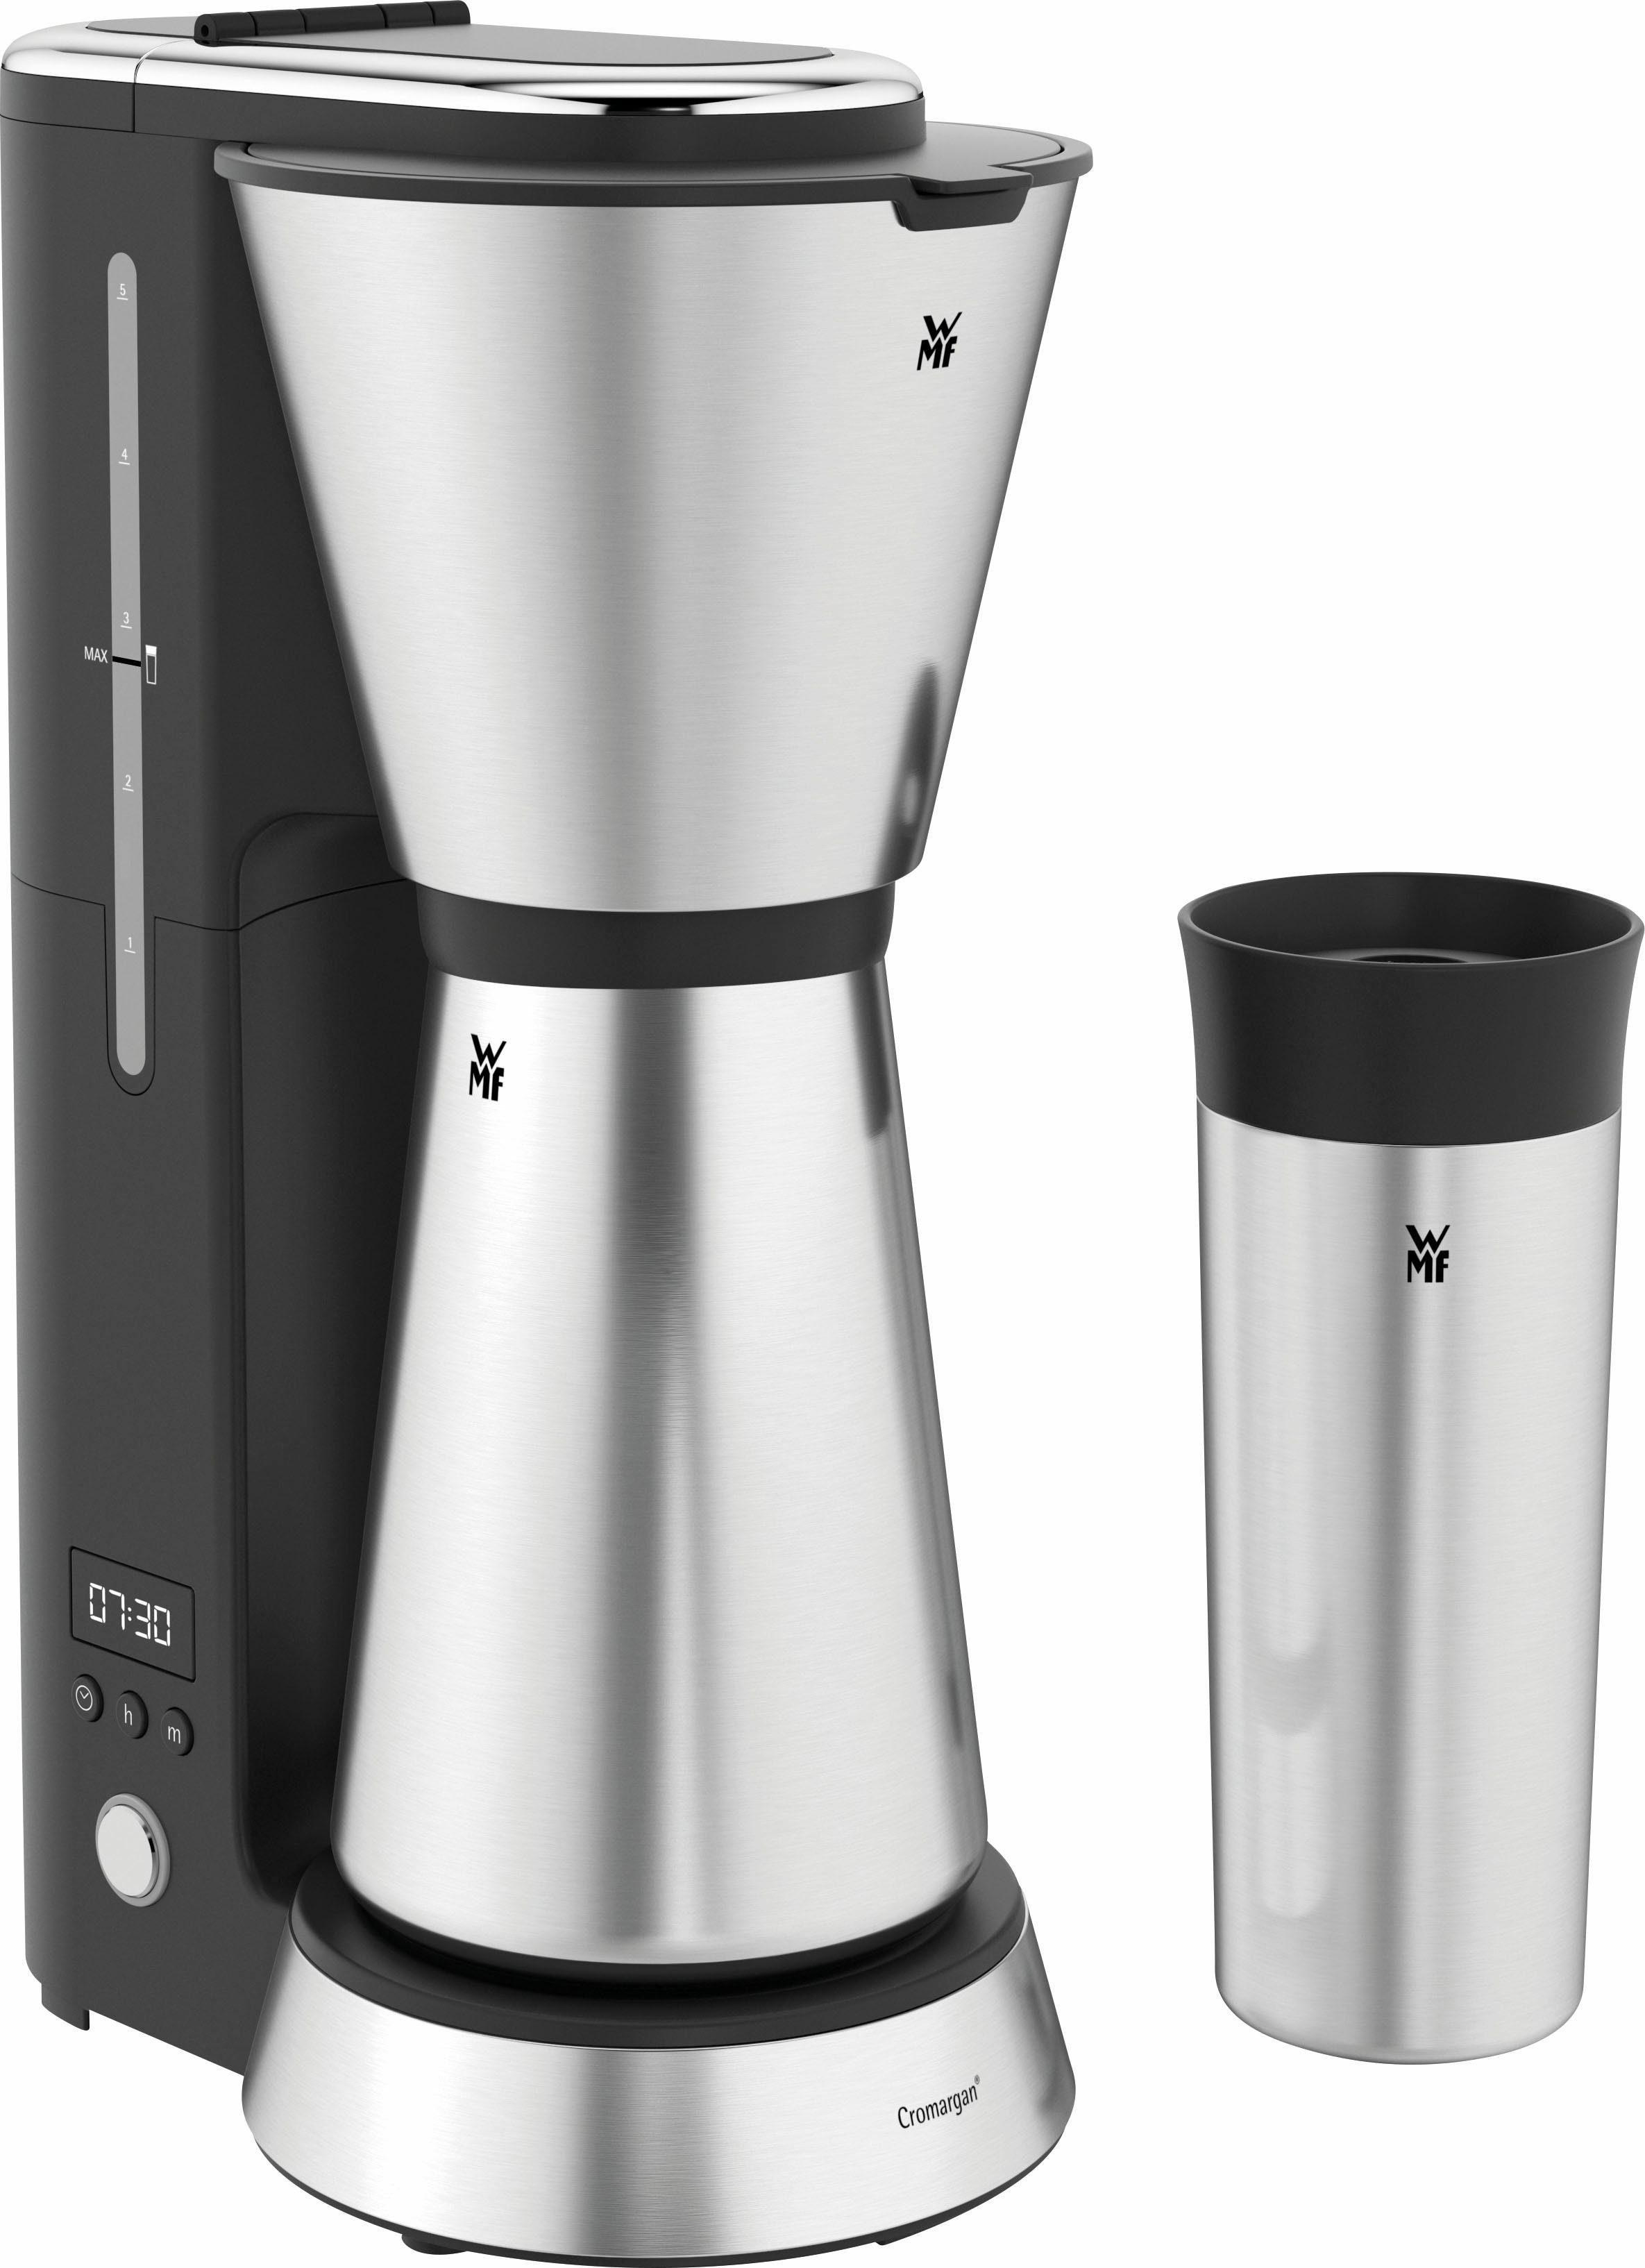 WMF Filterkaffeemaschine WMF KÜCHENminis® Aroma Kaffeemaschine Thermo to go, 0,65l Kaffeekanne, Papierfilter 1x2